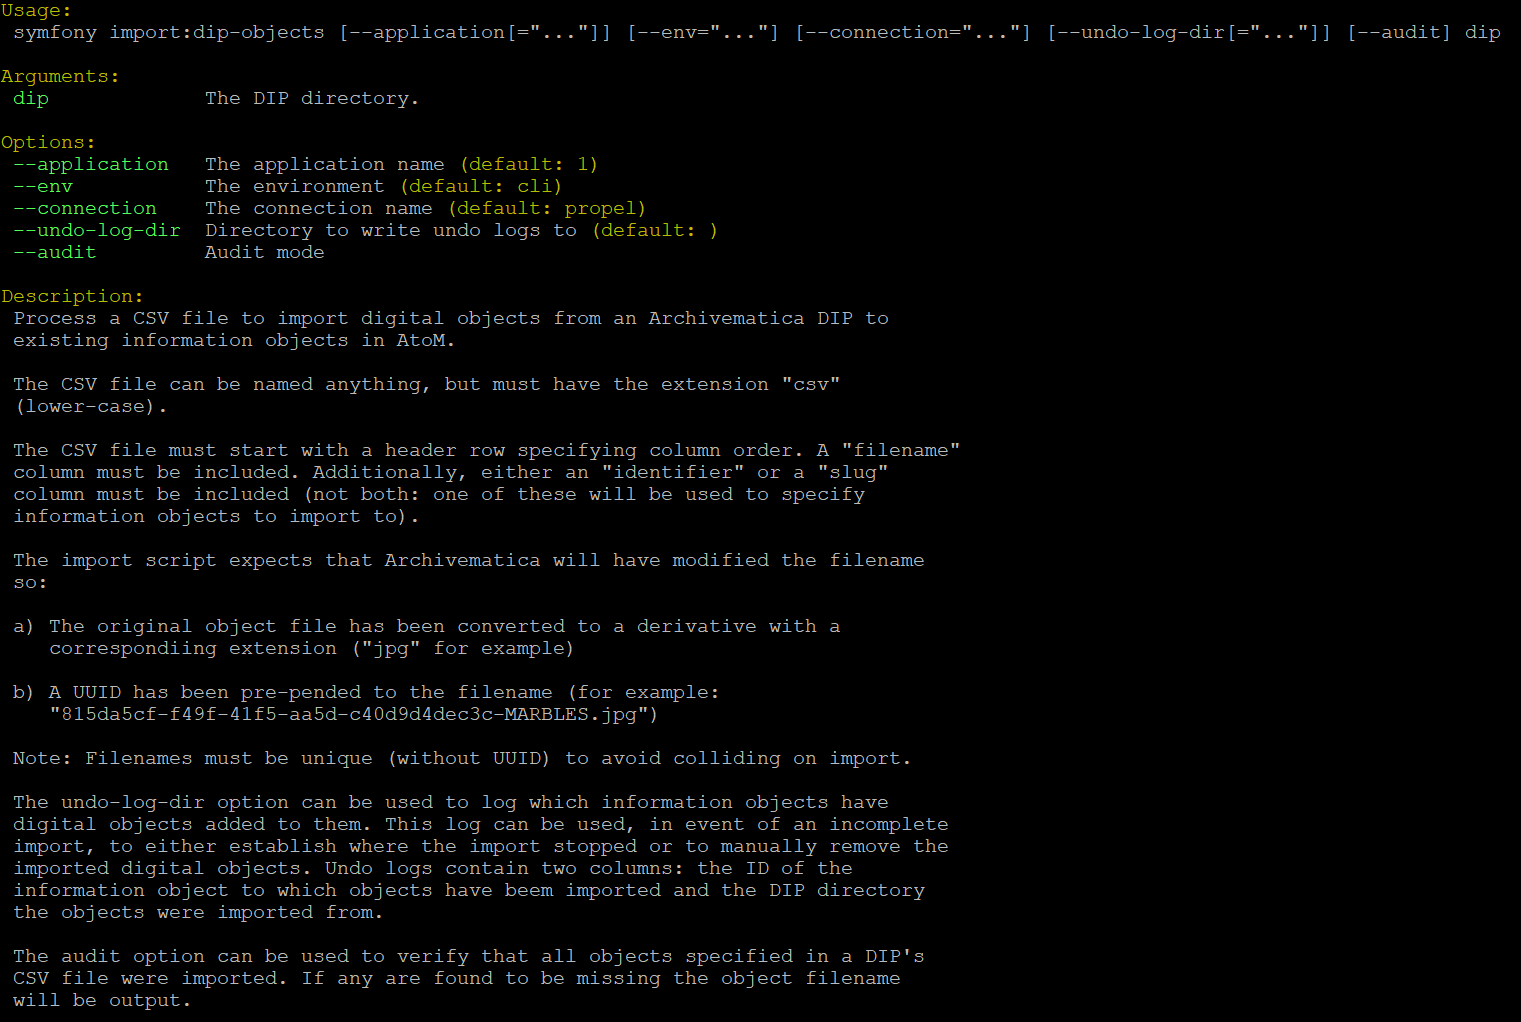 Command line tools   Documentation (Version 2 5)   AtoM: Open Source